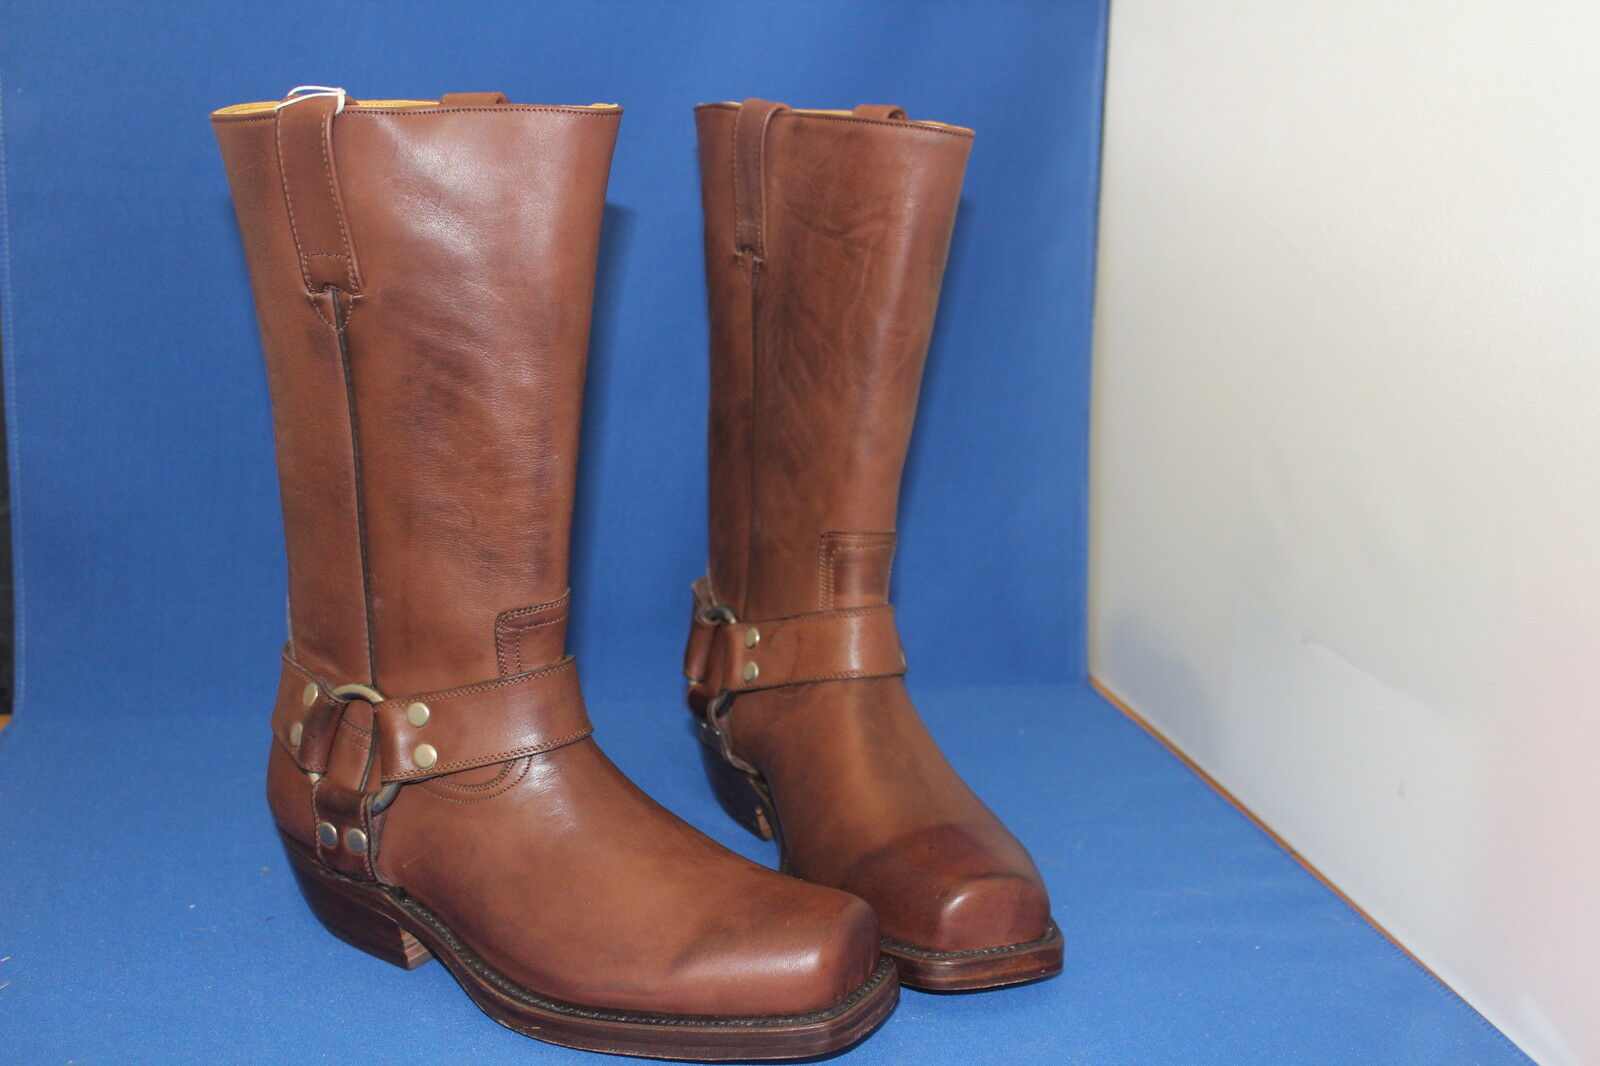 ADAM Stiefel top Western cowboystiefel Biker braunes Leder Western top neu gr.39 handmade neu 292c9f